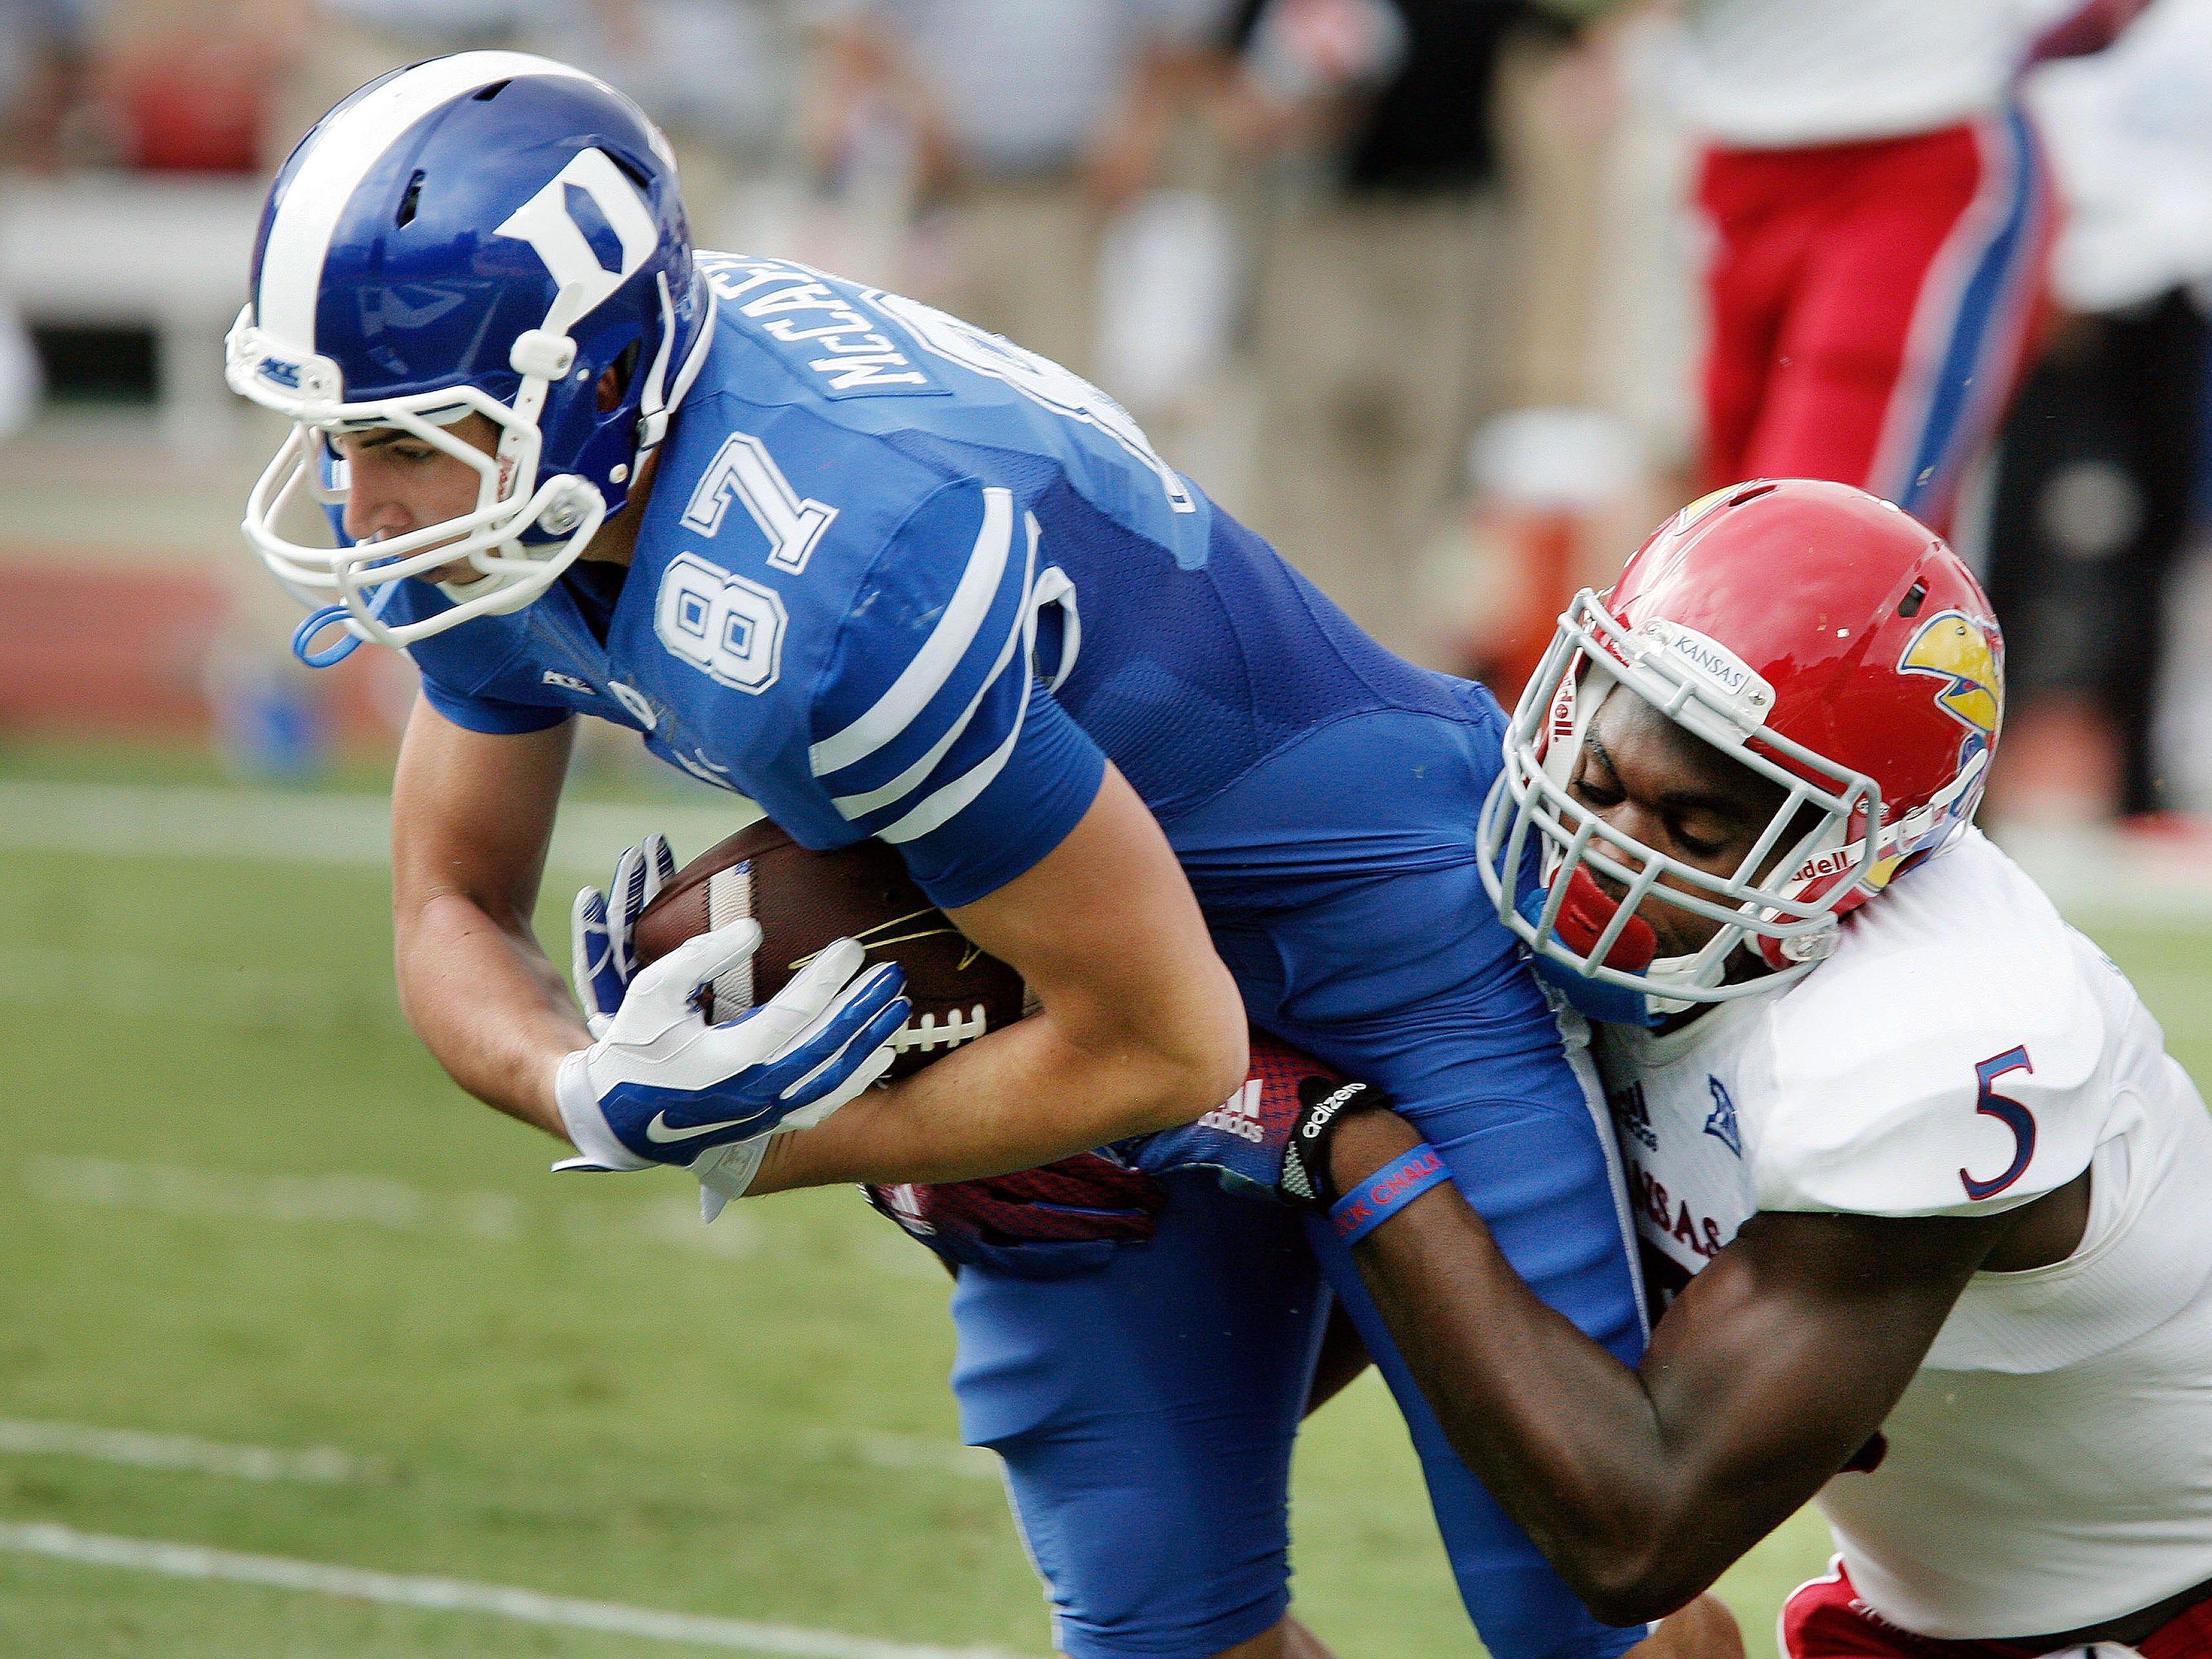 New USC safety Isaiah Johnson (5) had 146 tackles the past two seasons as a starter at Kansas.